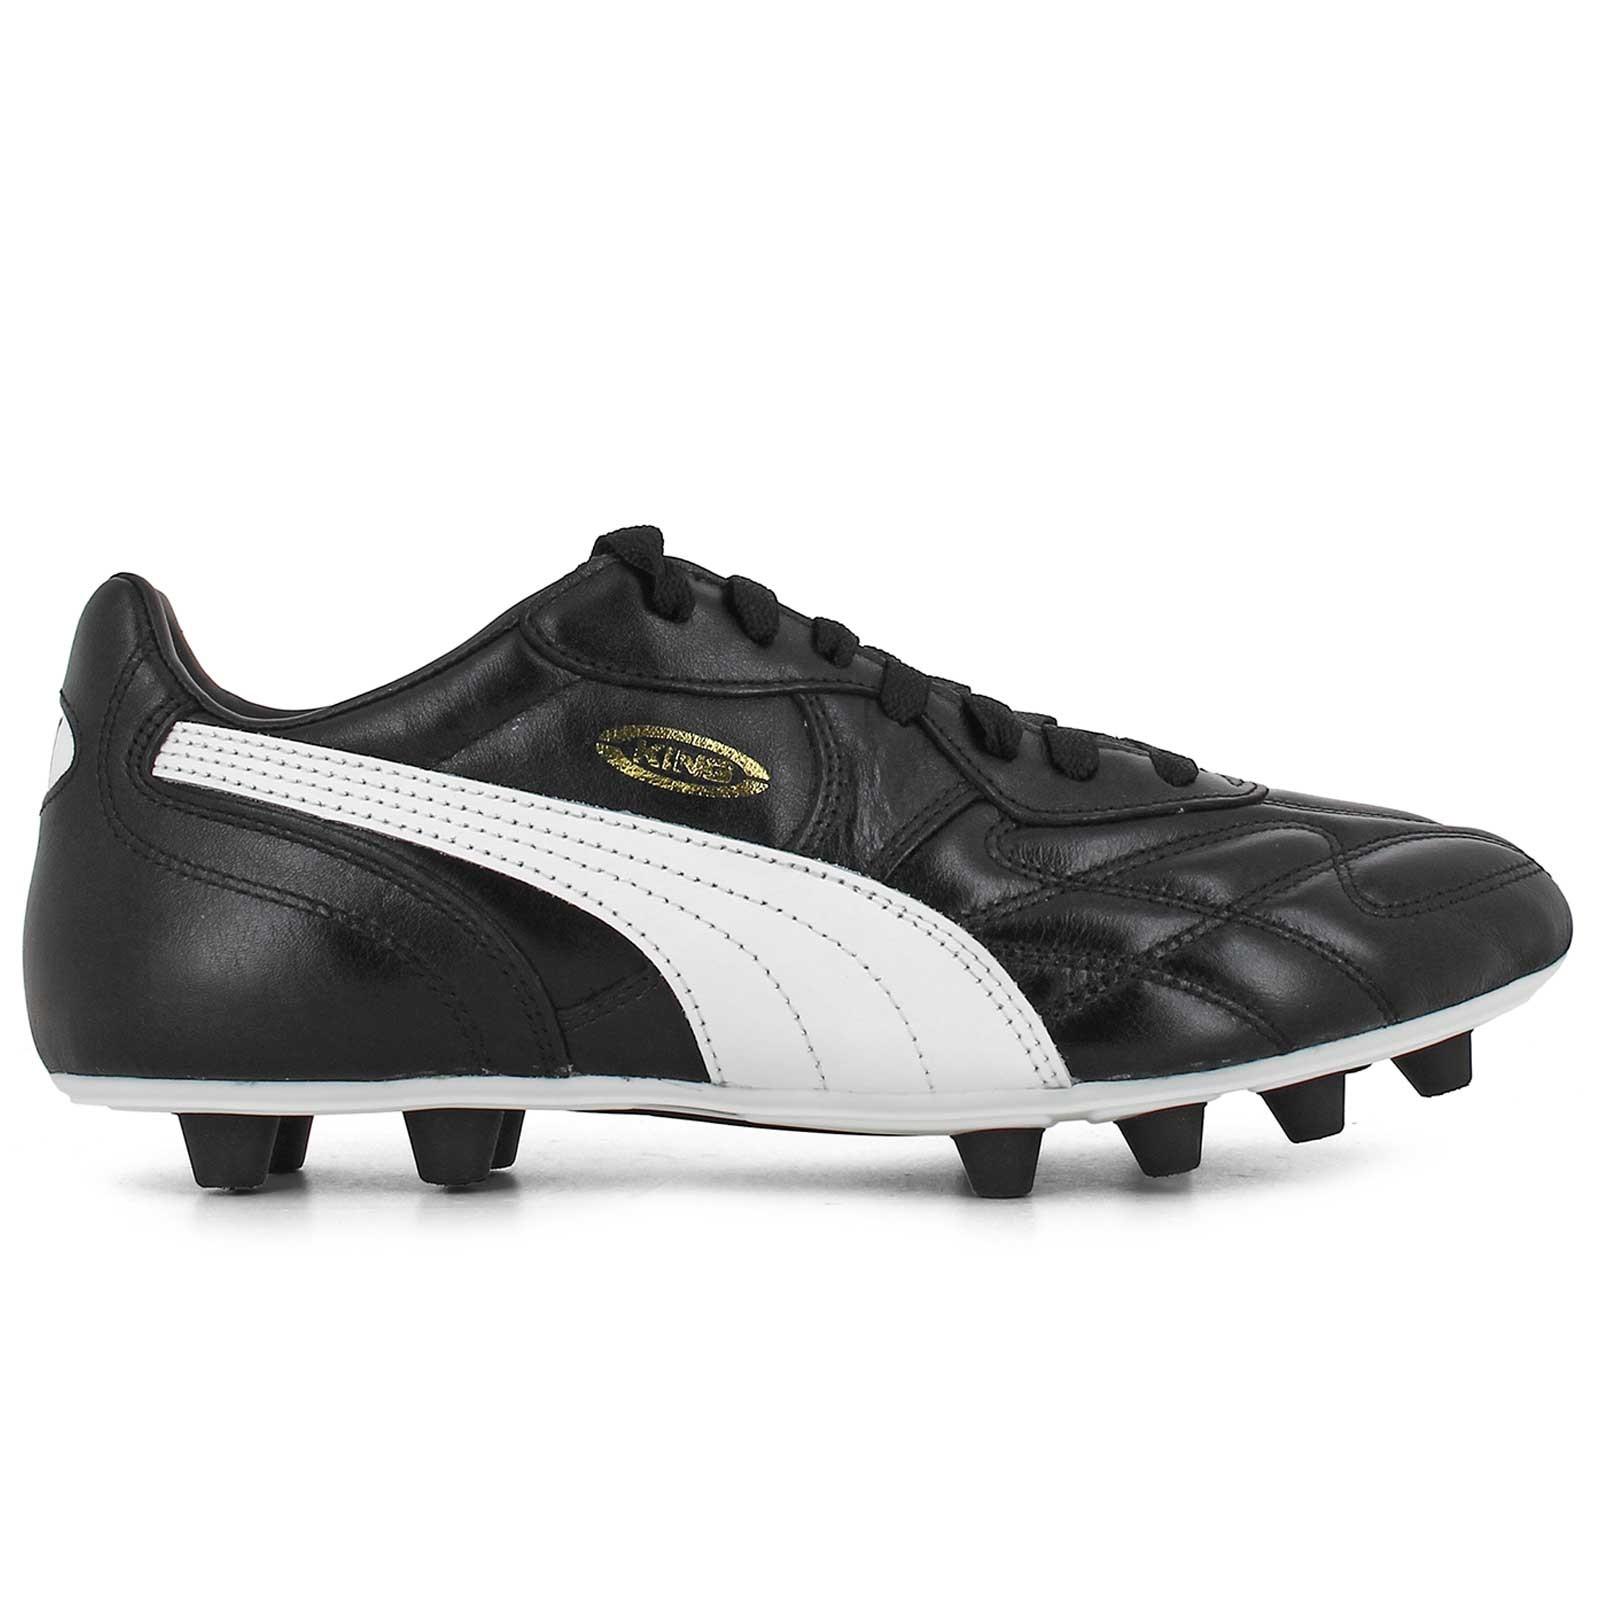 Puma King Top Di Fg Mens Cleat   Team Kits and Soccer United 6fa99c0514c3